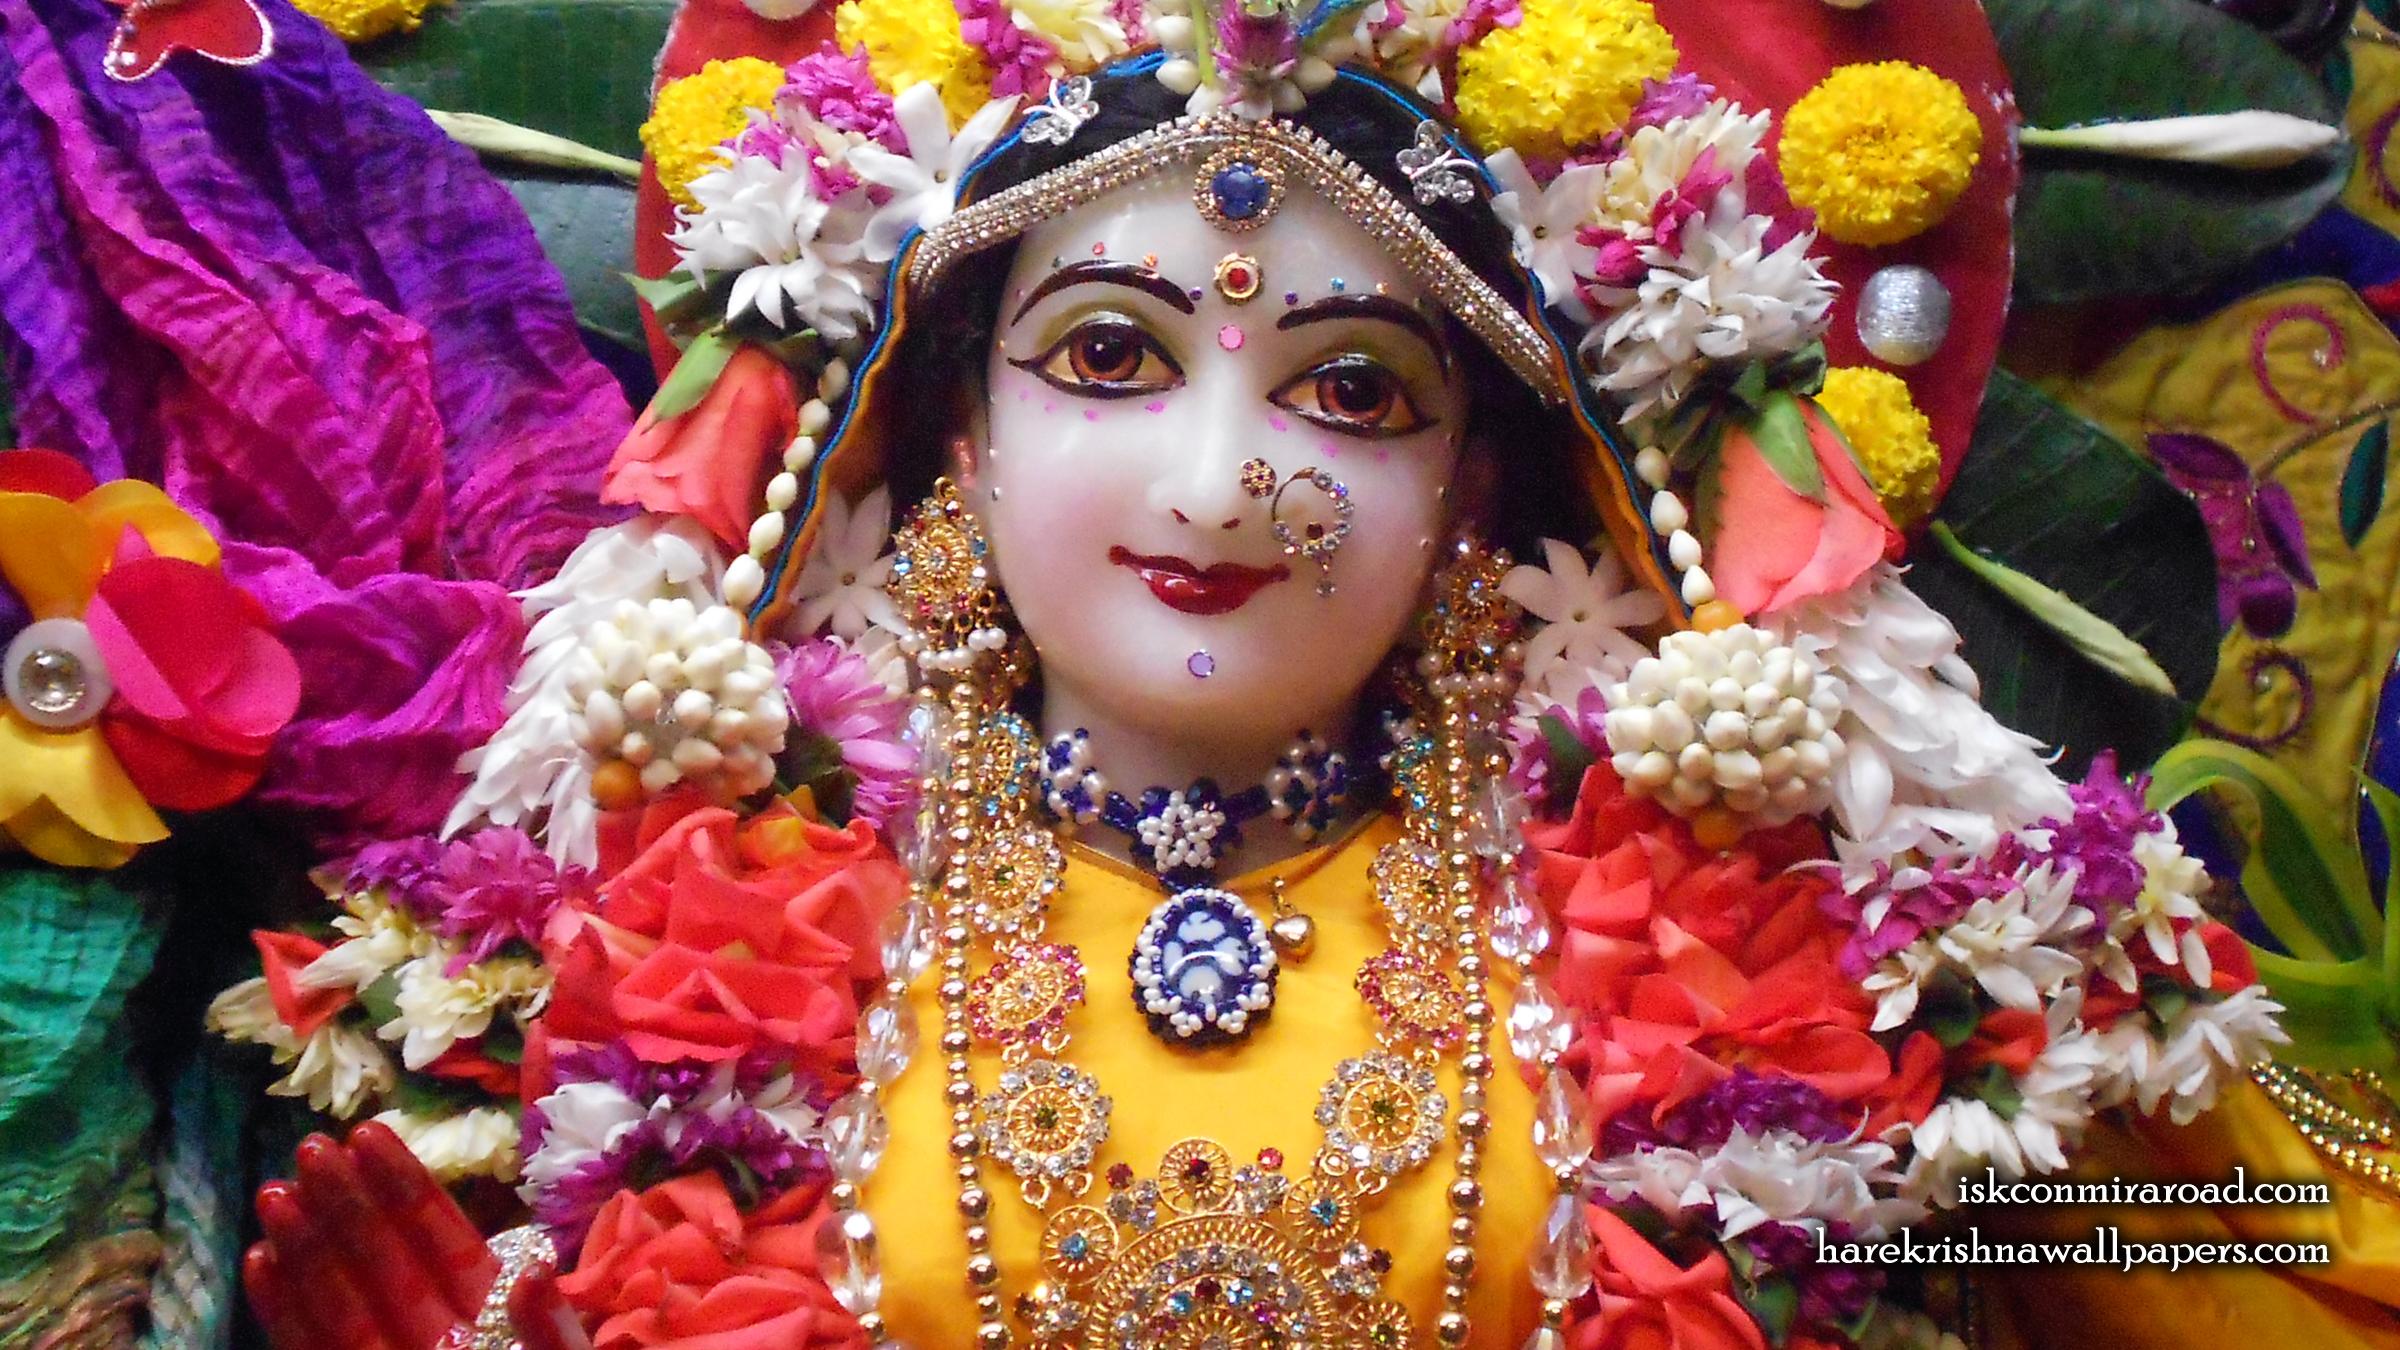 Sri Radha Close up Wallpaper (011) Size 2400x1350 Download